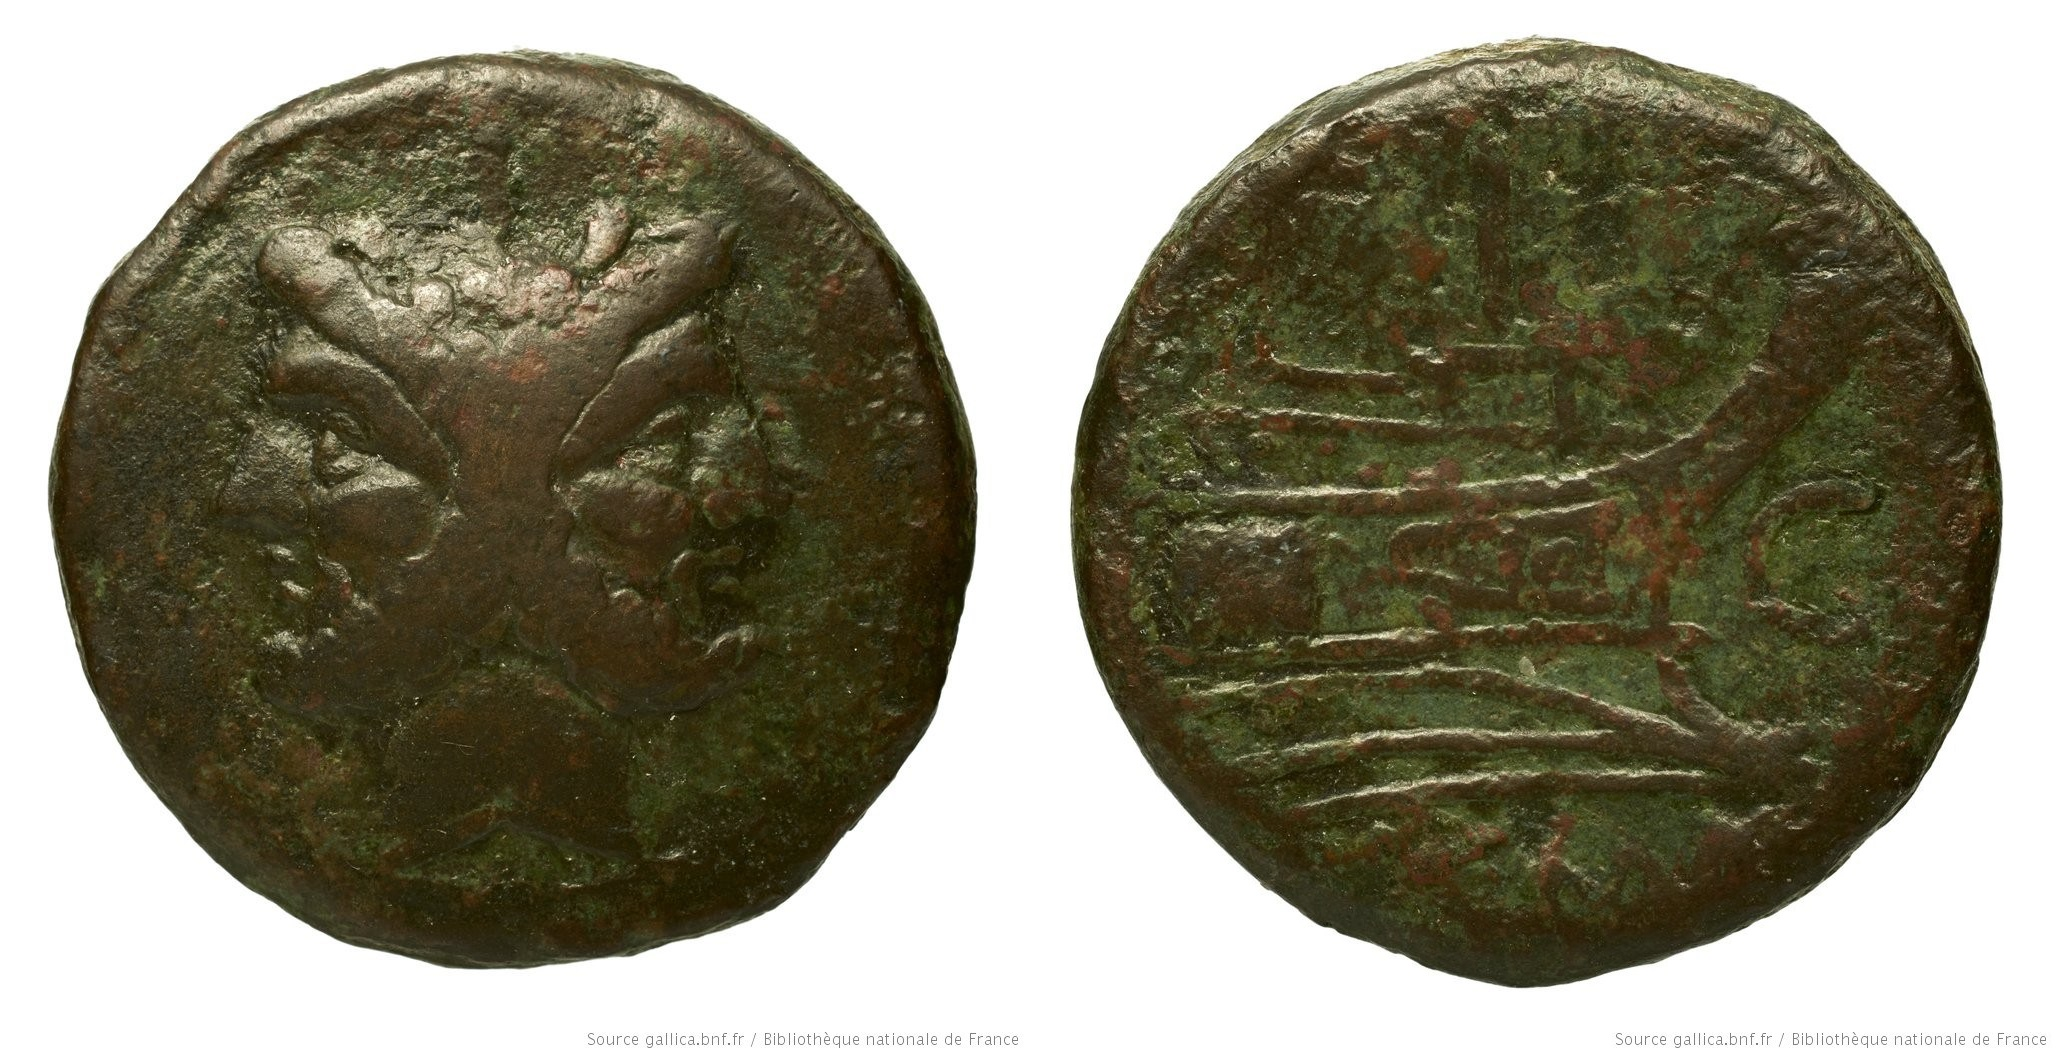 241CO – As Cornelia – L. Cornelius Lentulus